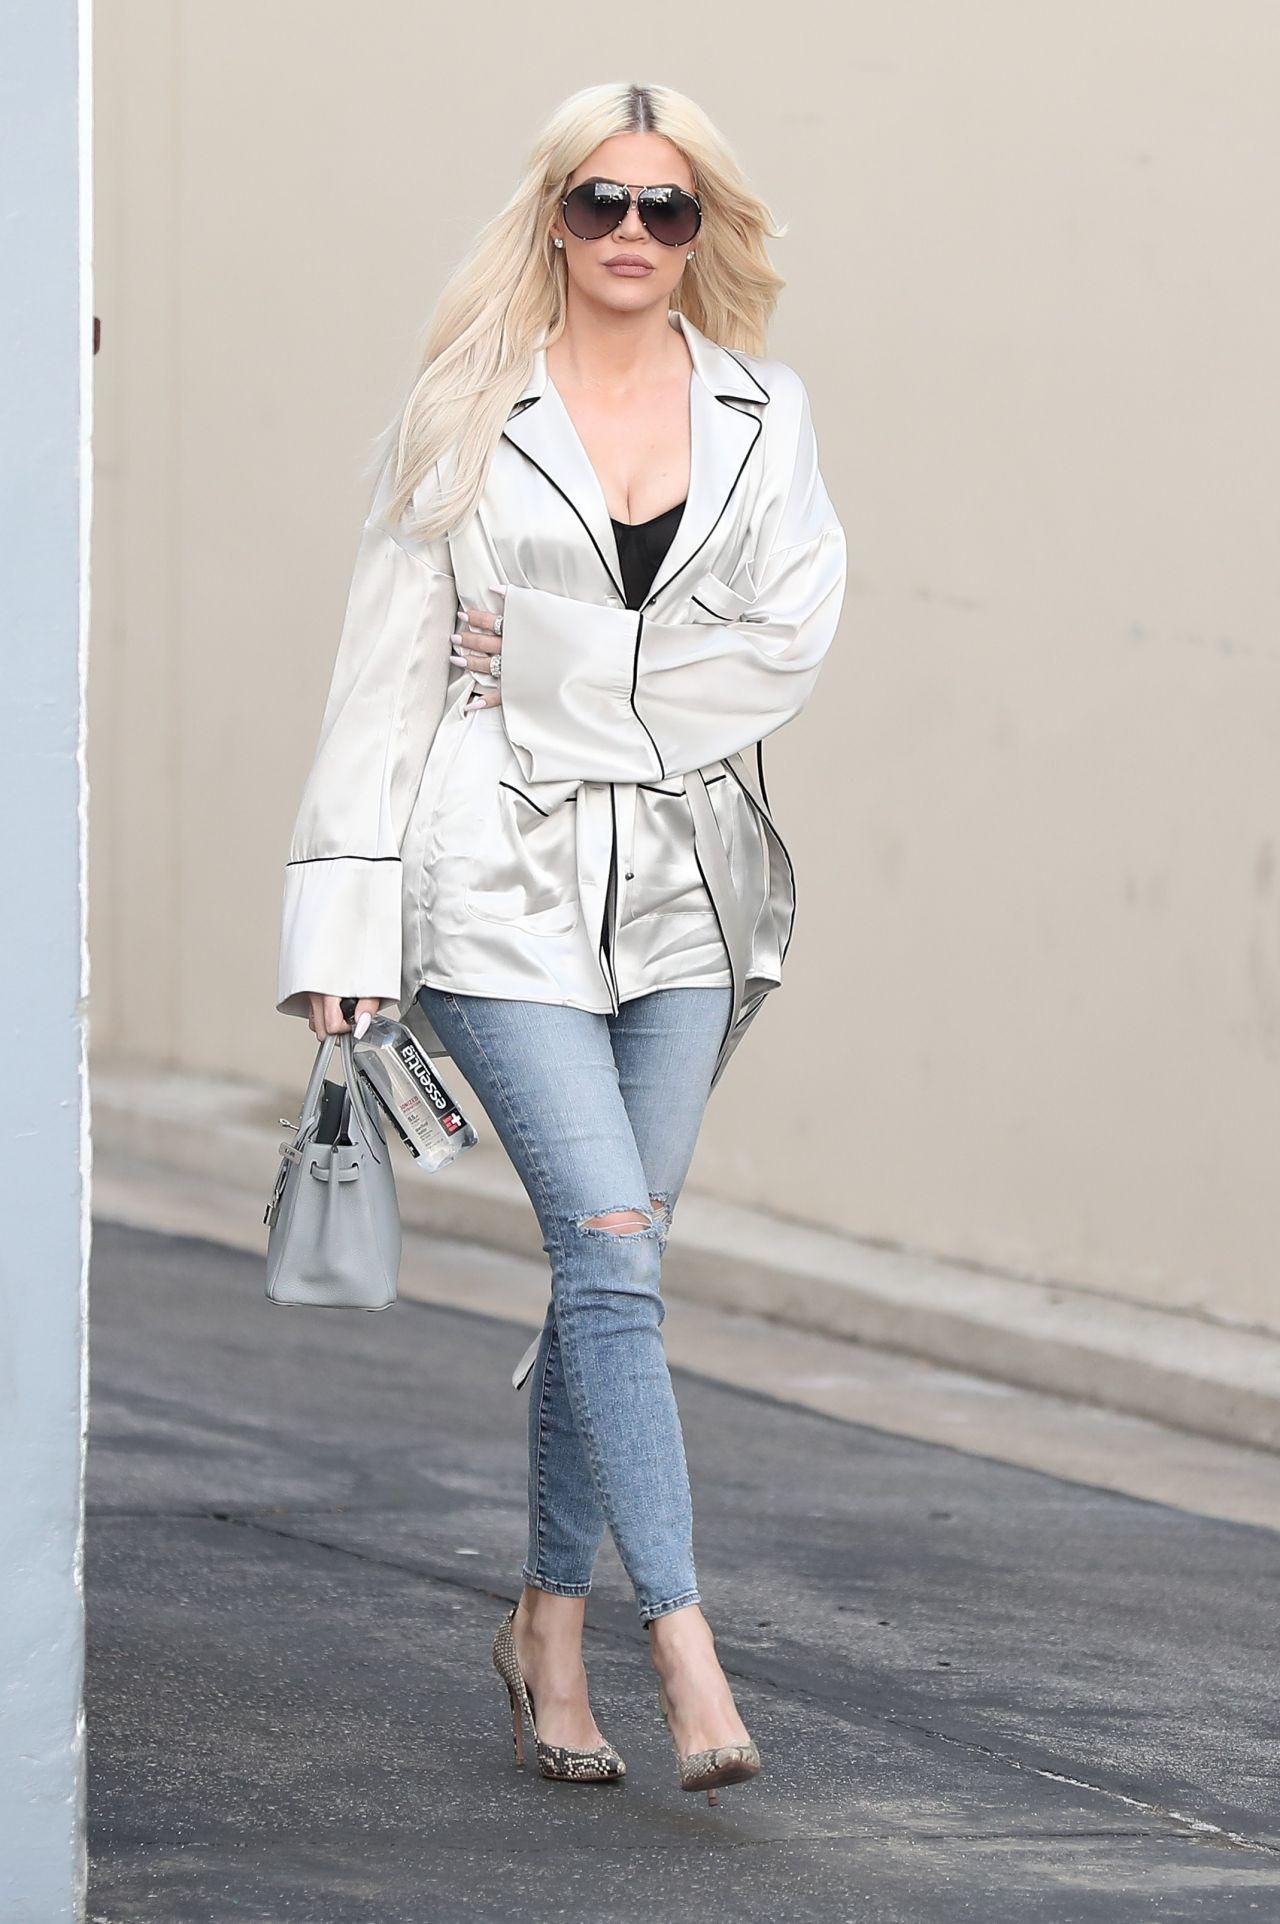 Khloe Kardashian - Leaving a Studio in Calabasas 01/09/2019